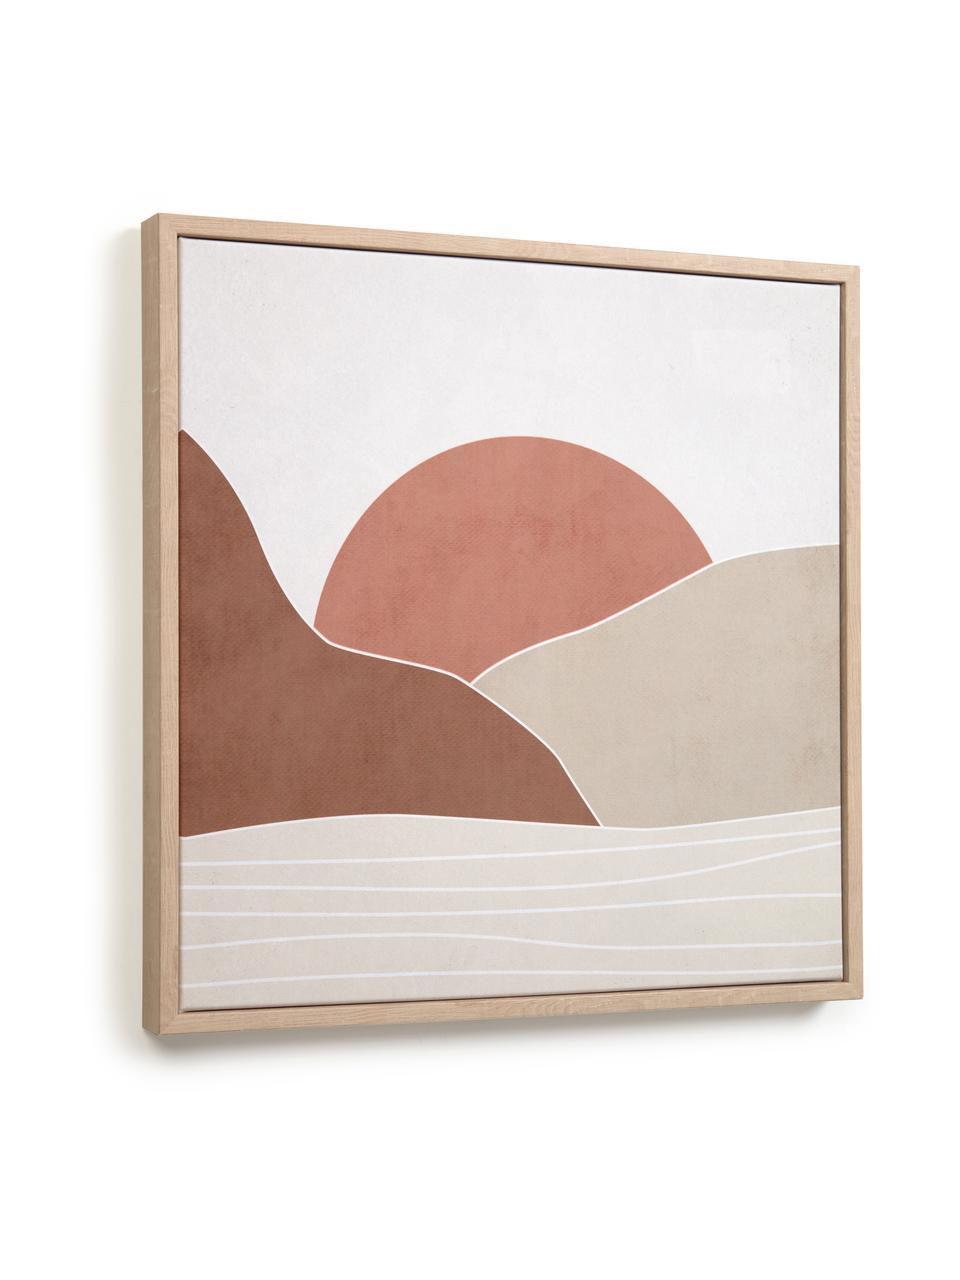 Ingelijste digitale print Izem Sun, Lijst: gecoat MDF, Afbeelding: canvas, Beige, bruin, oudroze, wit, 40 x 40 cm